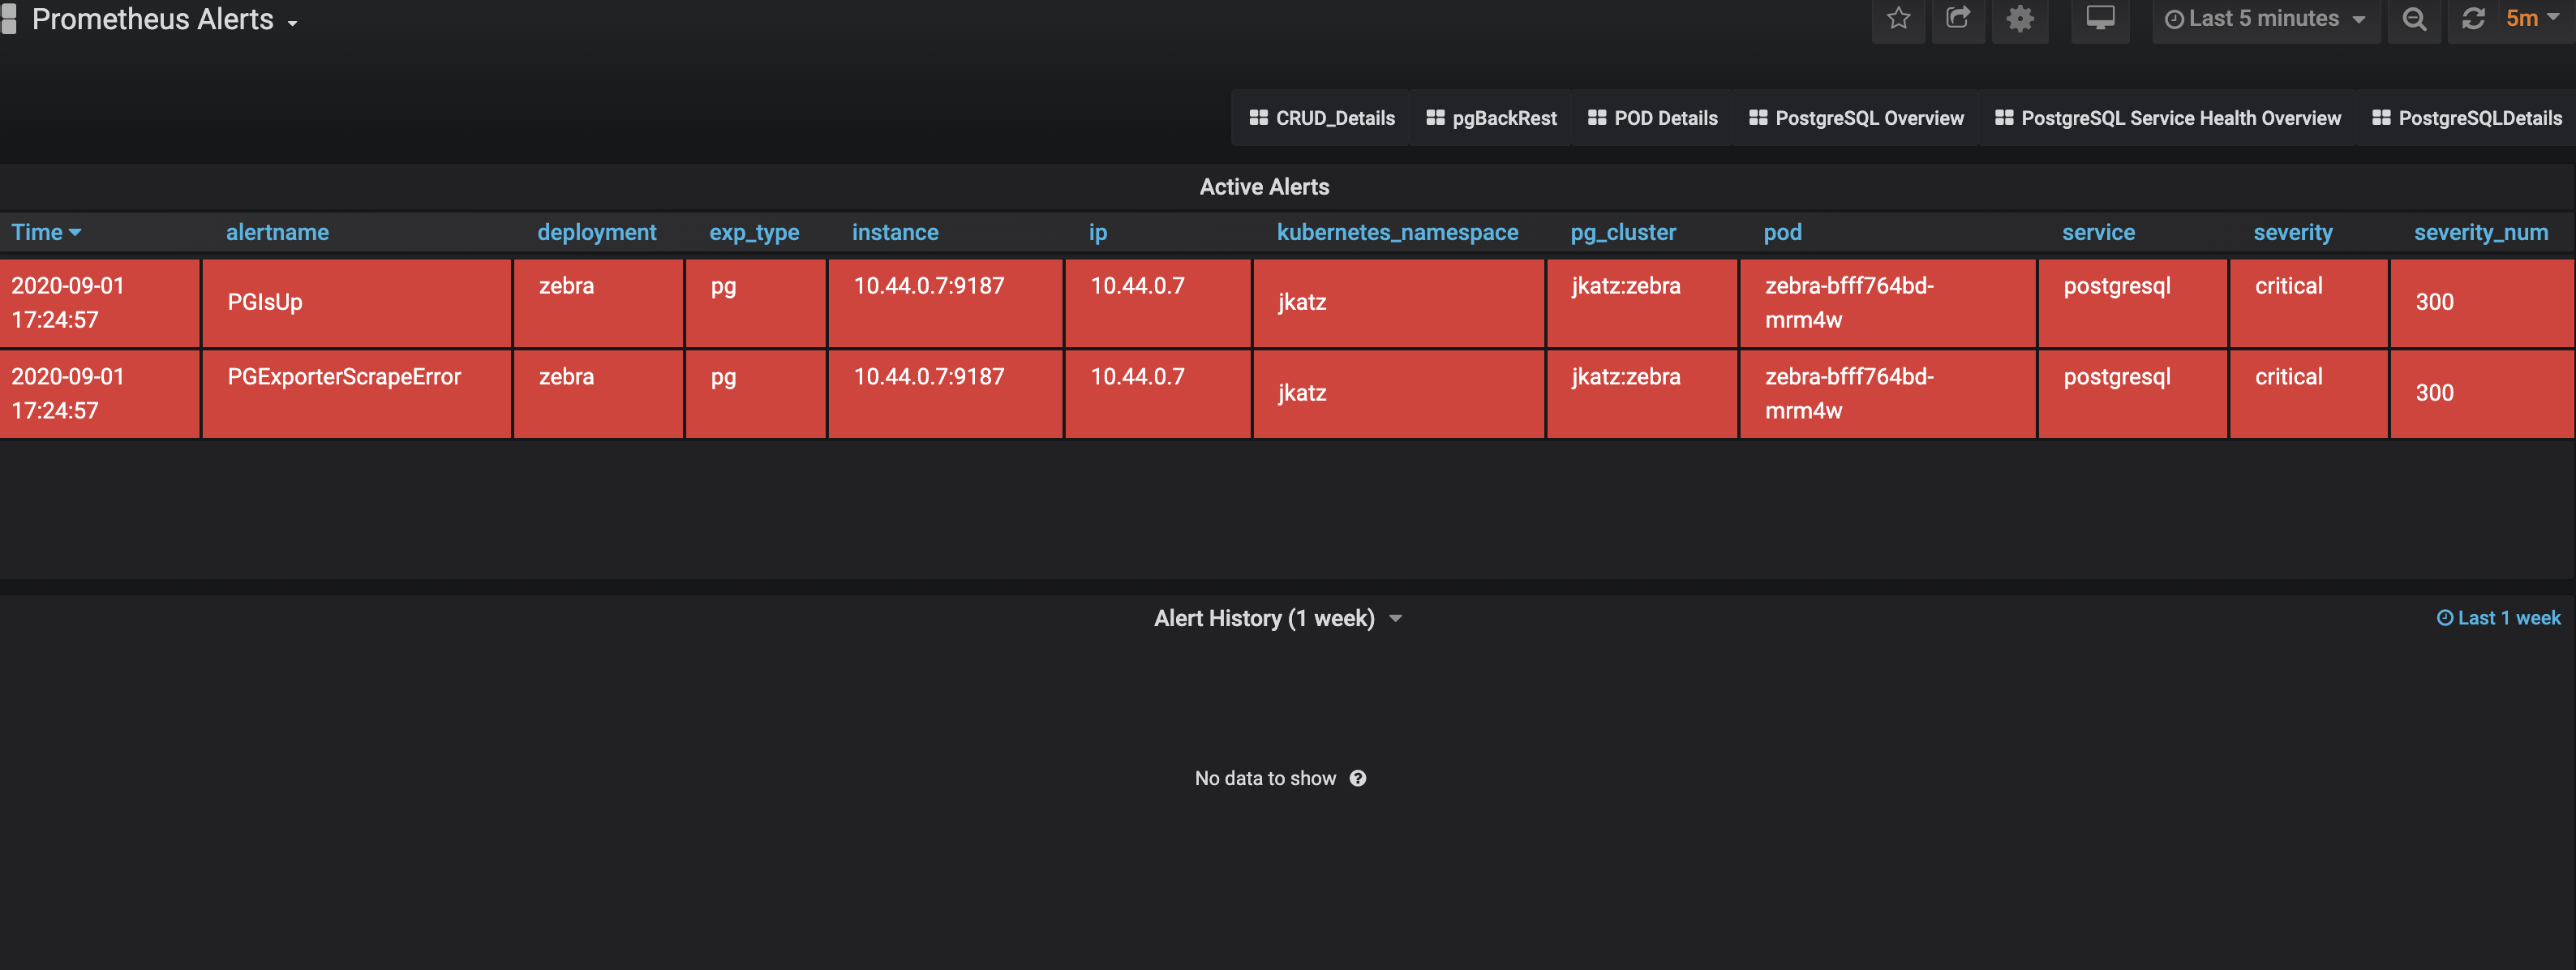 postgresql-monitoring-alerts